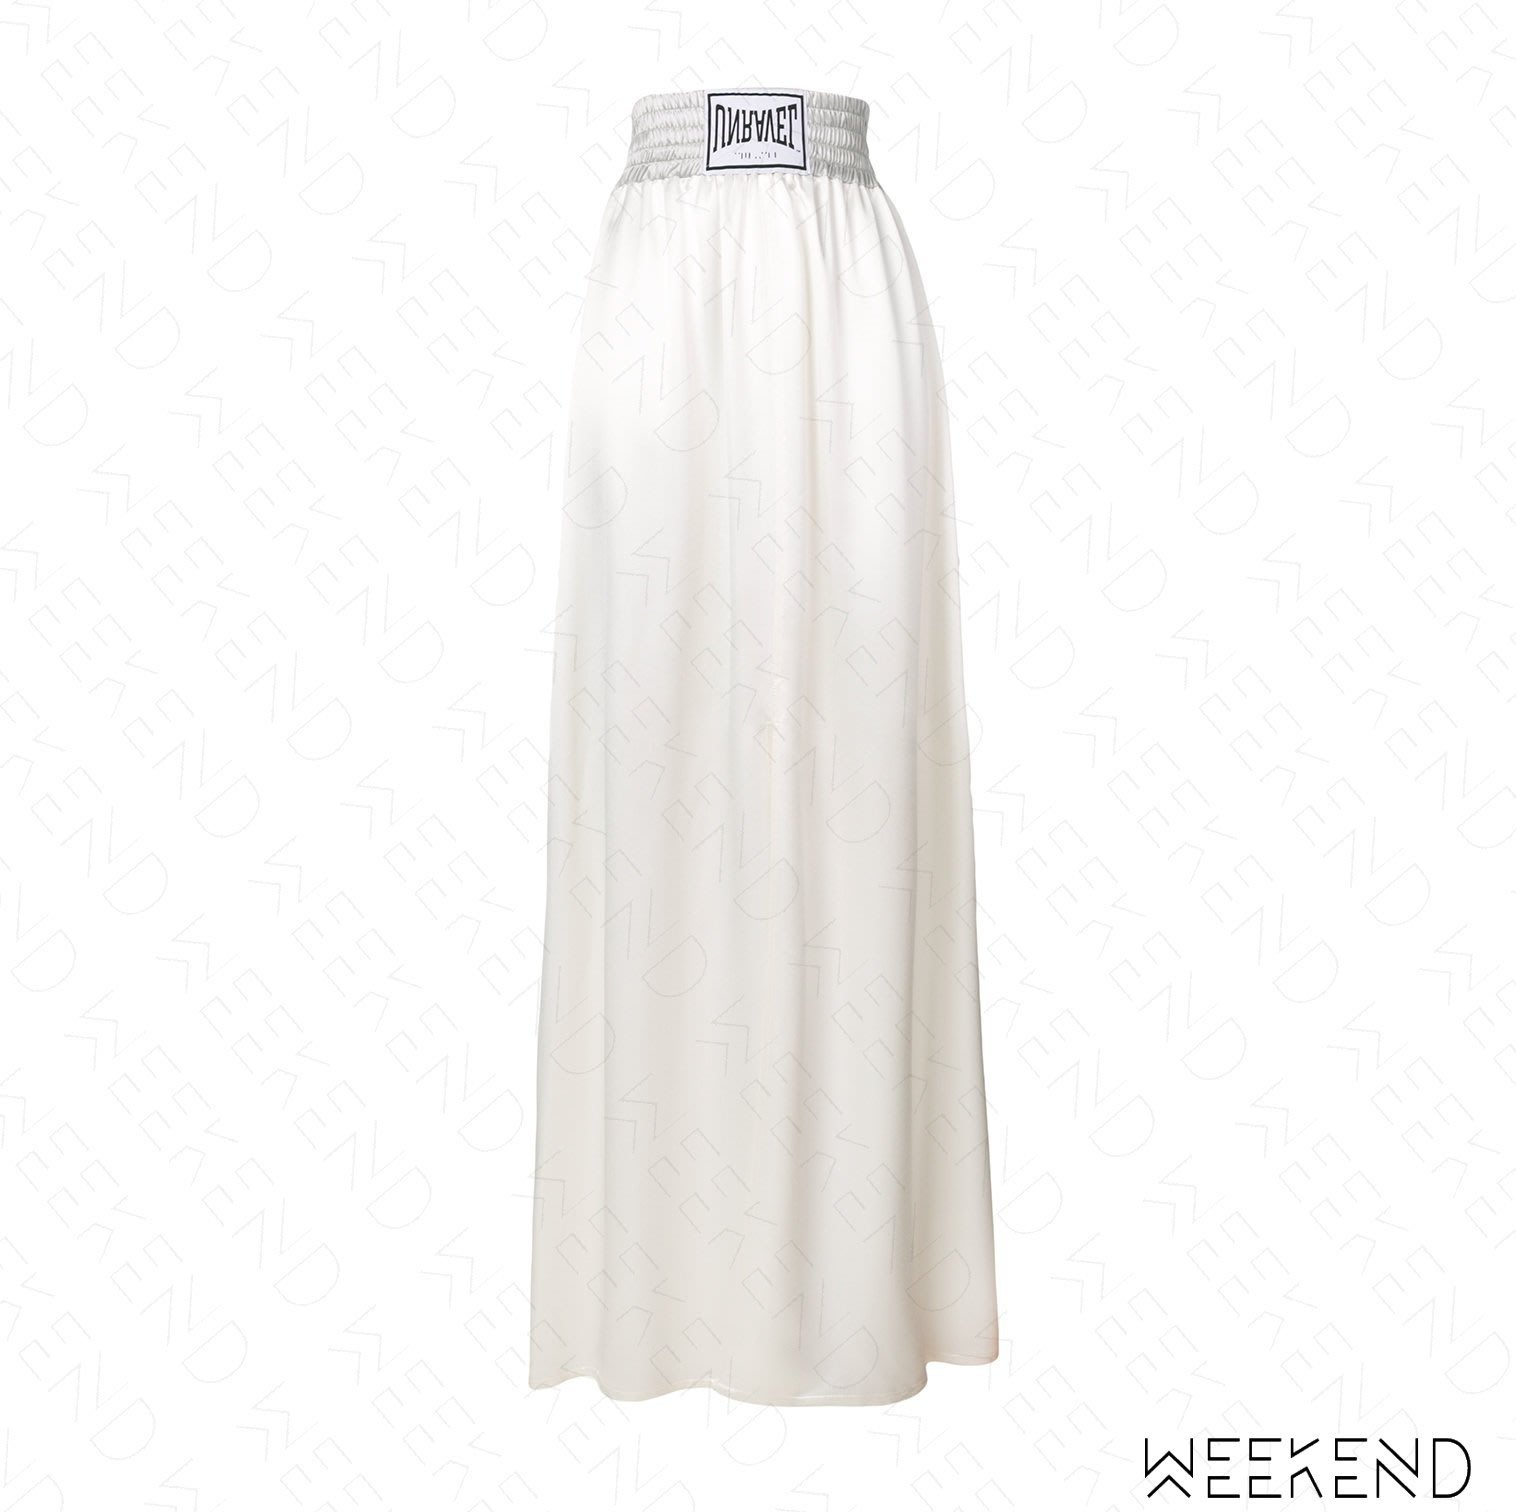 【WEEKEND】 UNRAVEL Logo Maxi 側邊開岔 裙子 長裙 淺灰色 18春夏新款